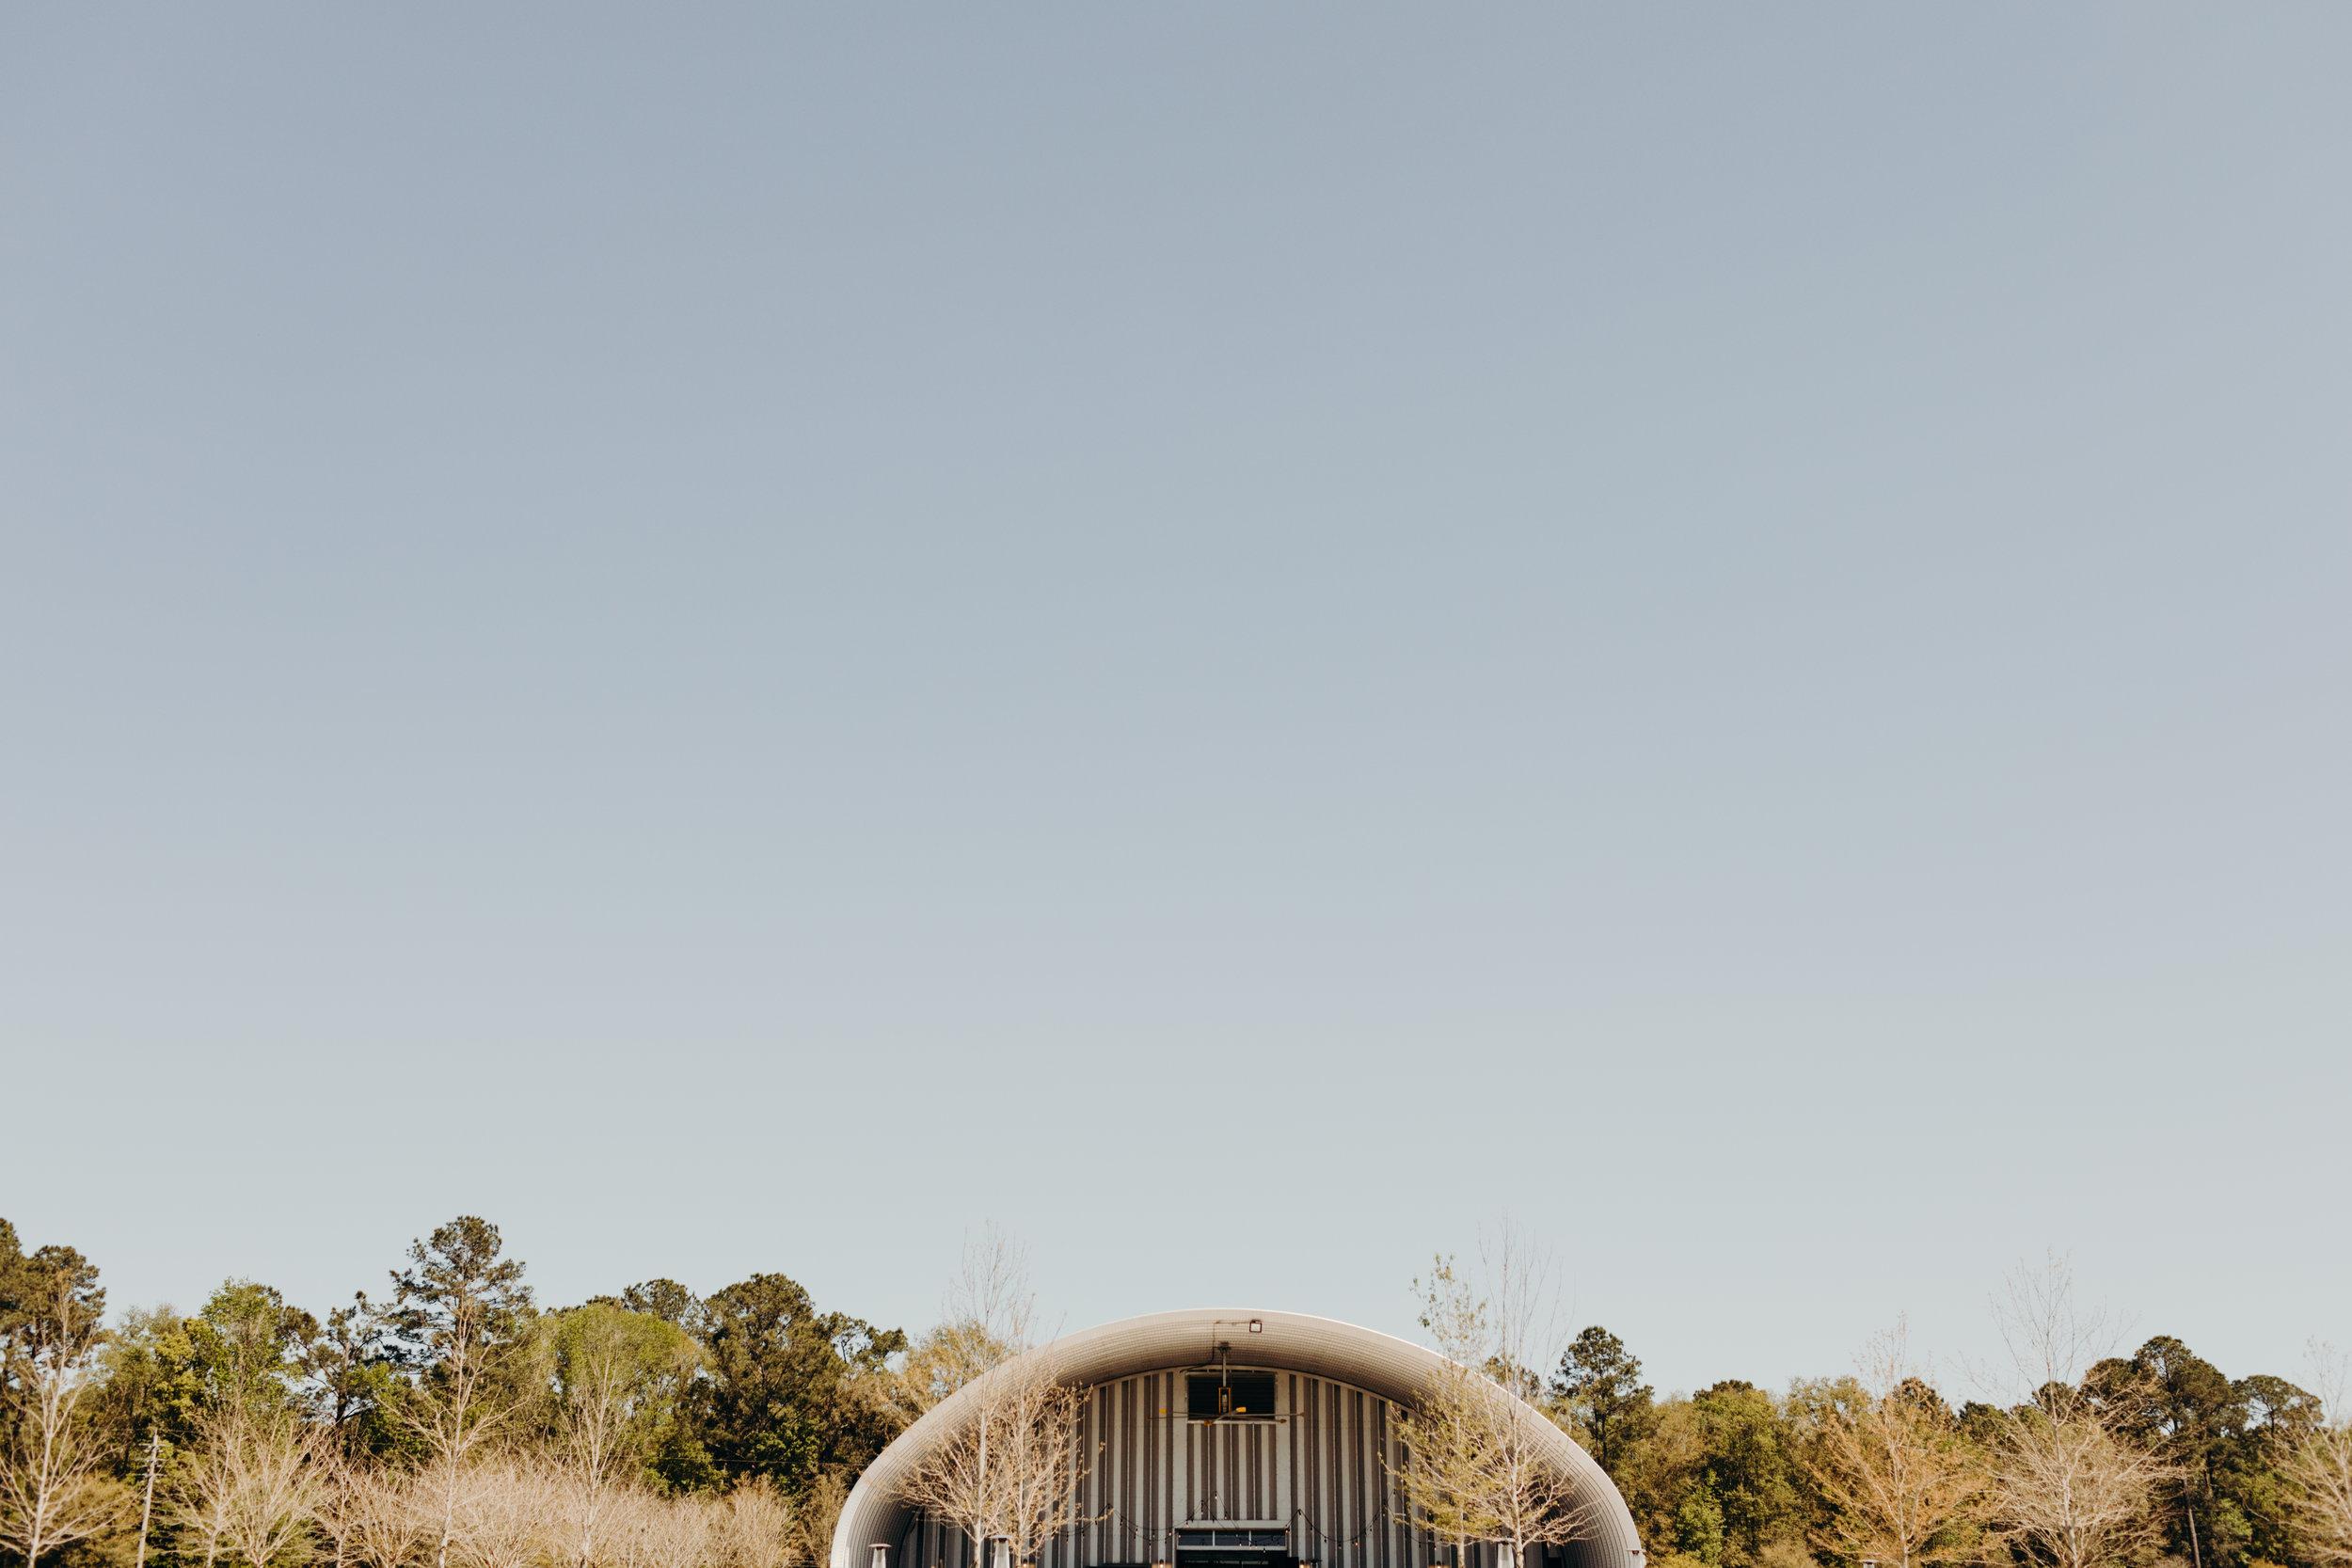 Christoper & Kristin - A modern farm wedding.